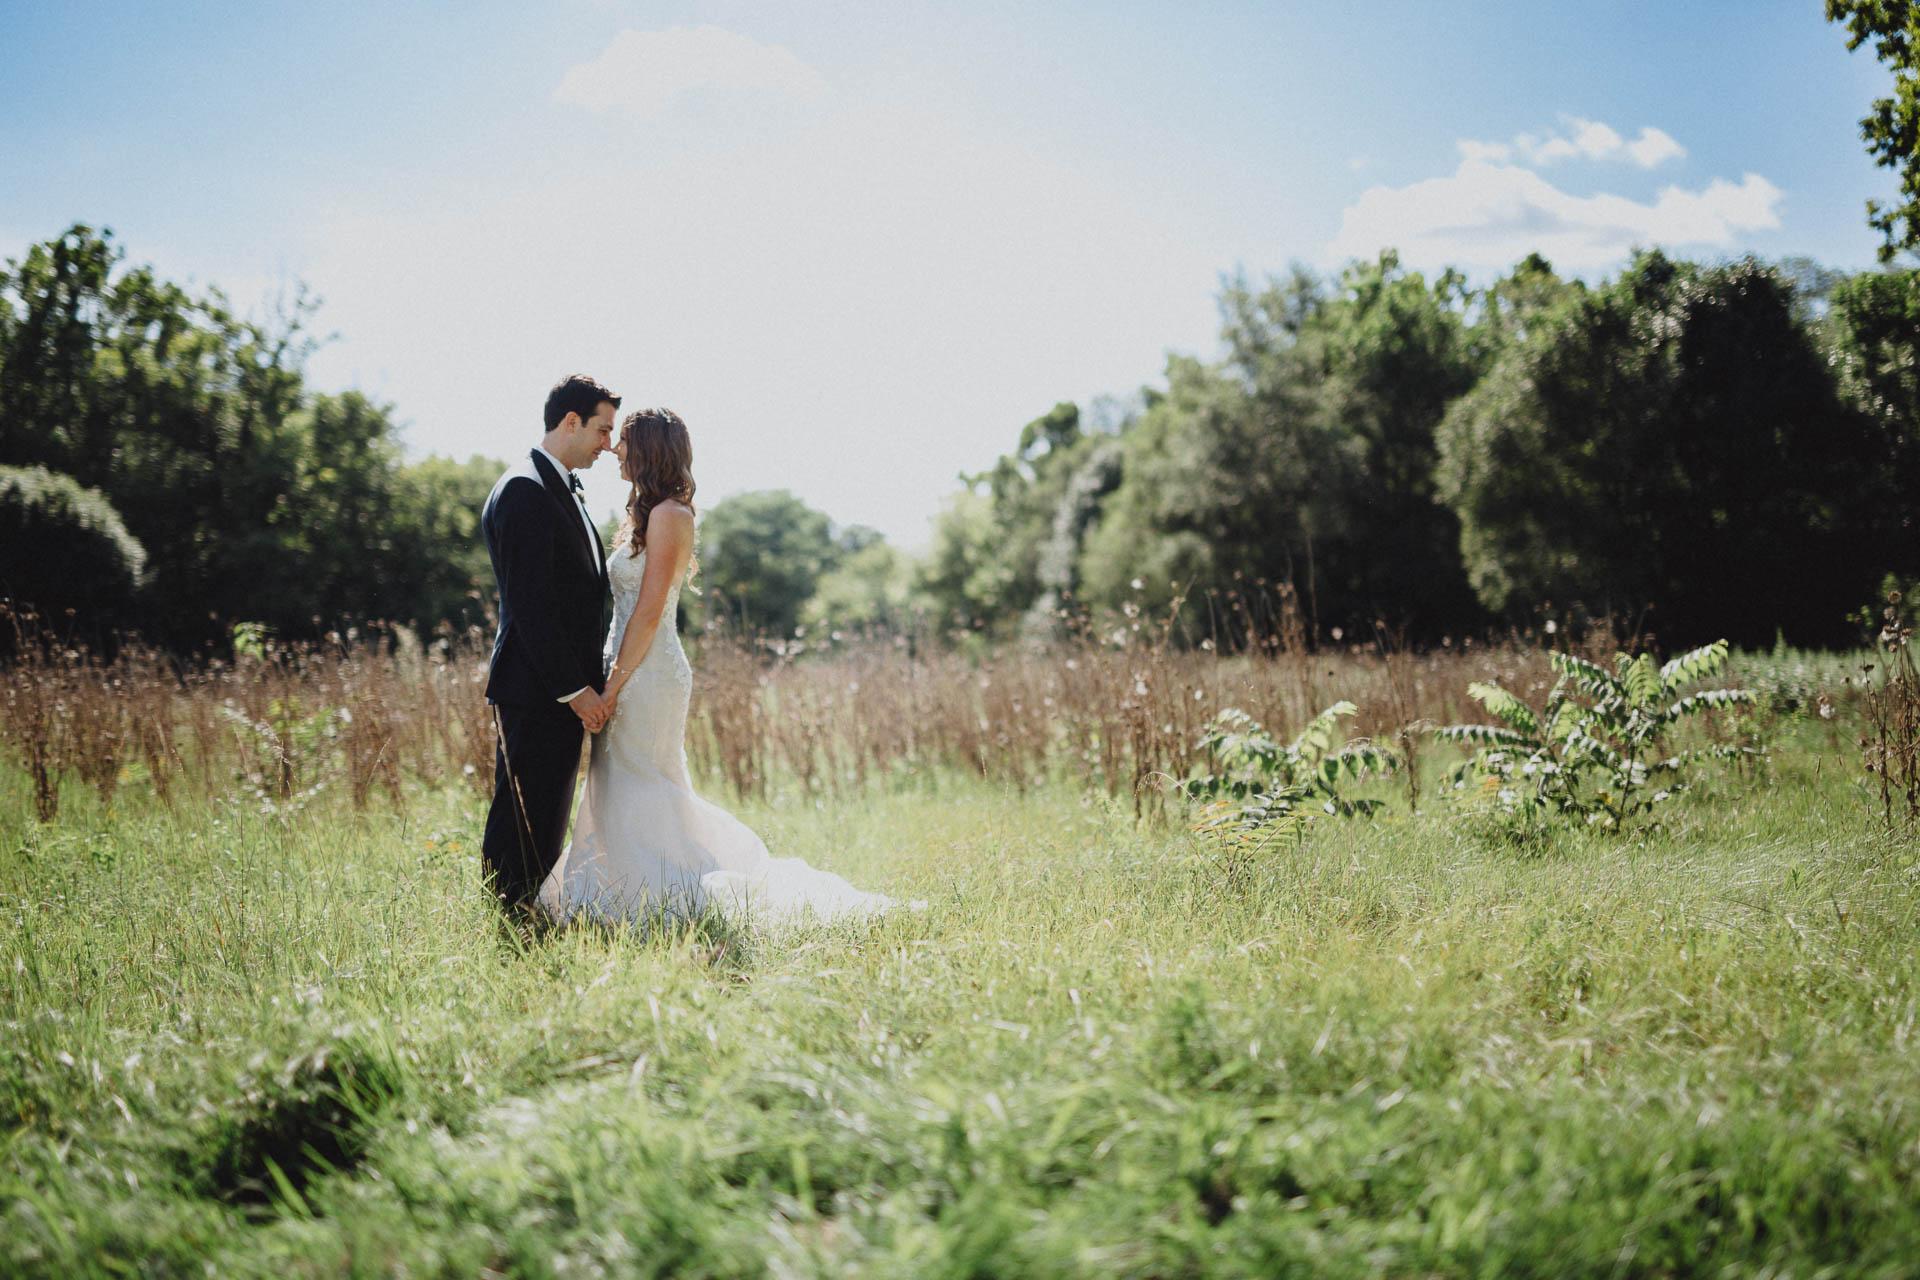 Keri-Joseph-Top-of-the-Market-Wedding-129@2x.jpg